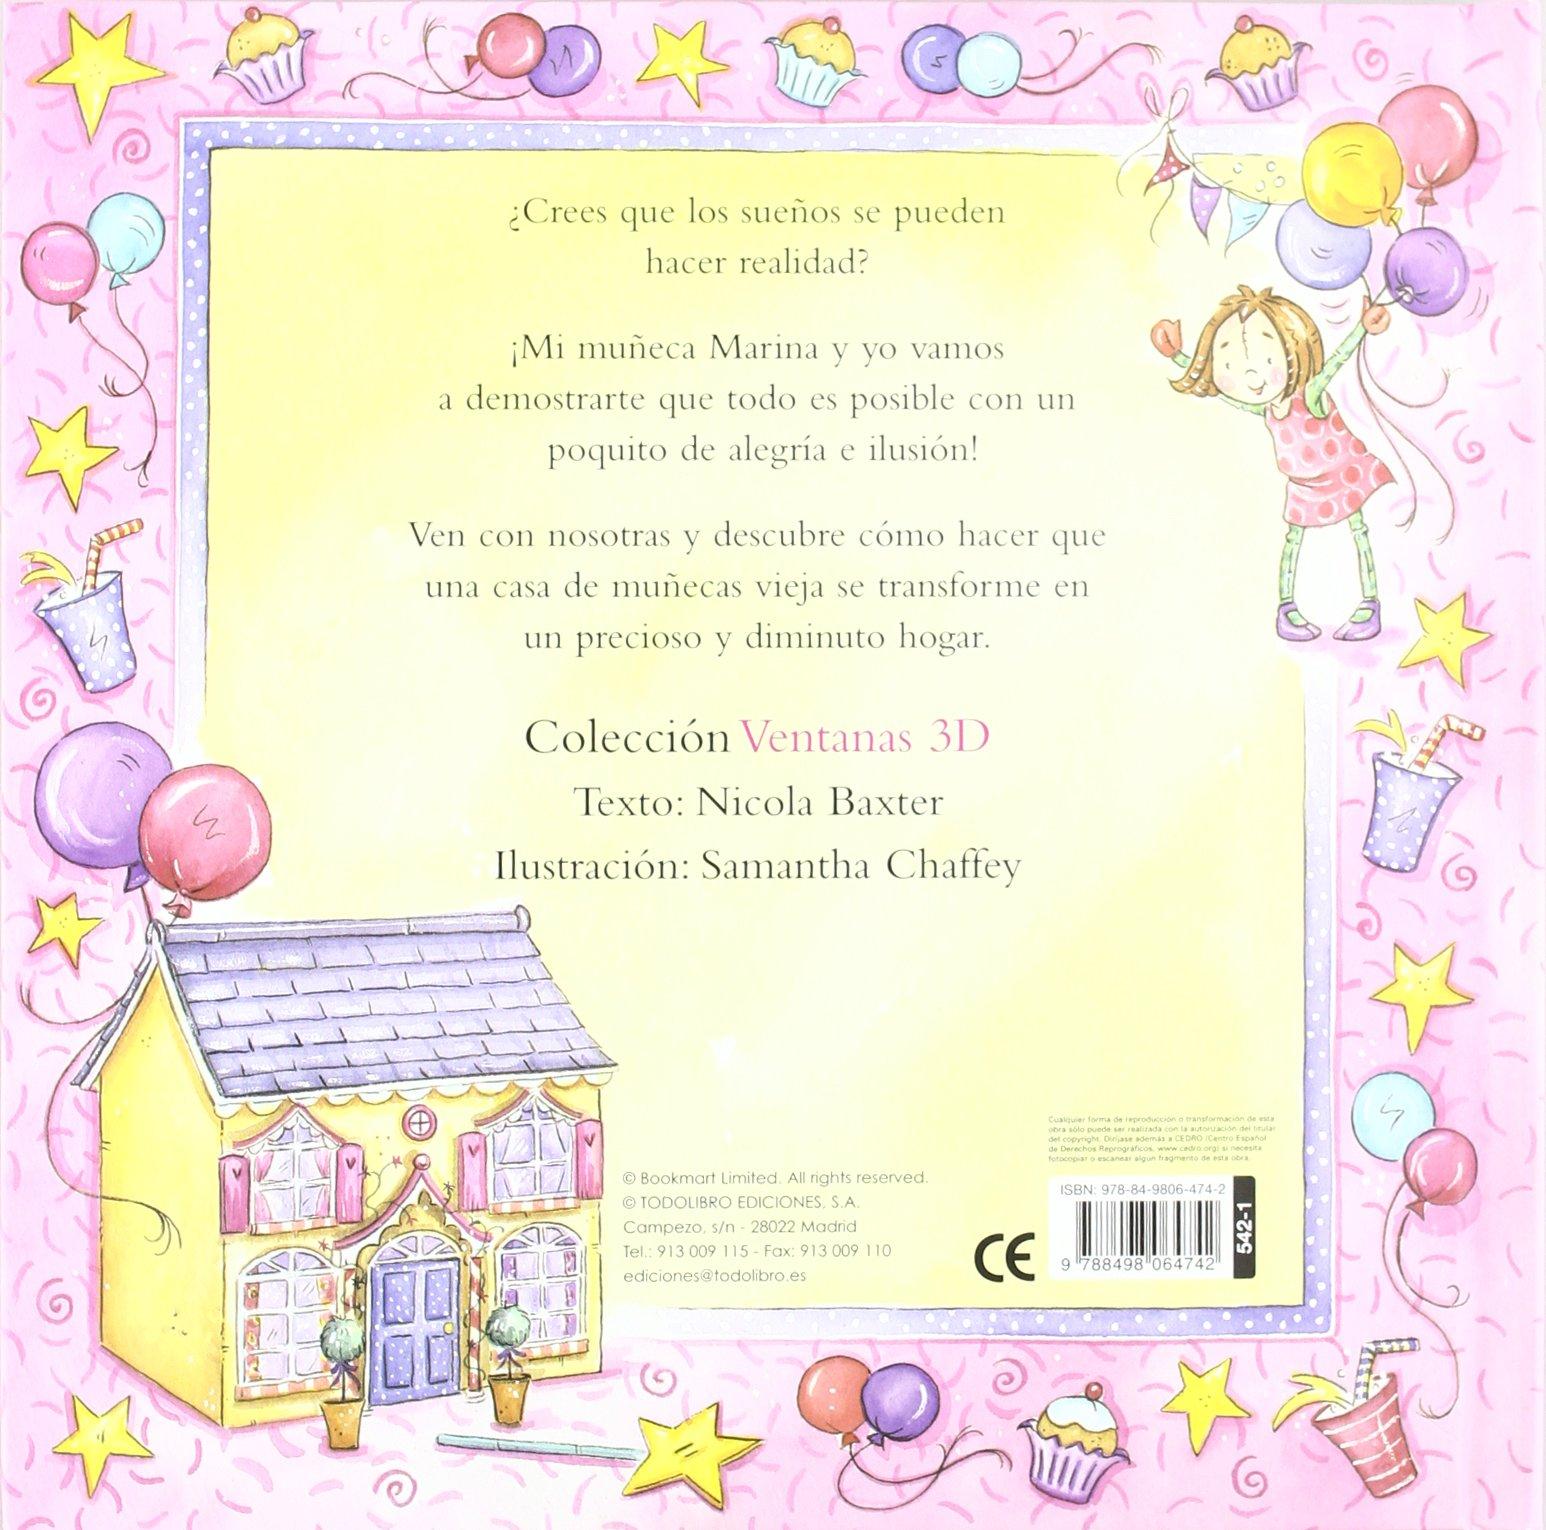 MI CASA DE MUÑECAS - VENTANAS 3D: AA.VV.: 9788498064742: Amazon.com: Books